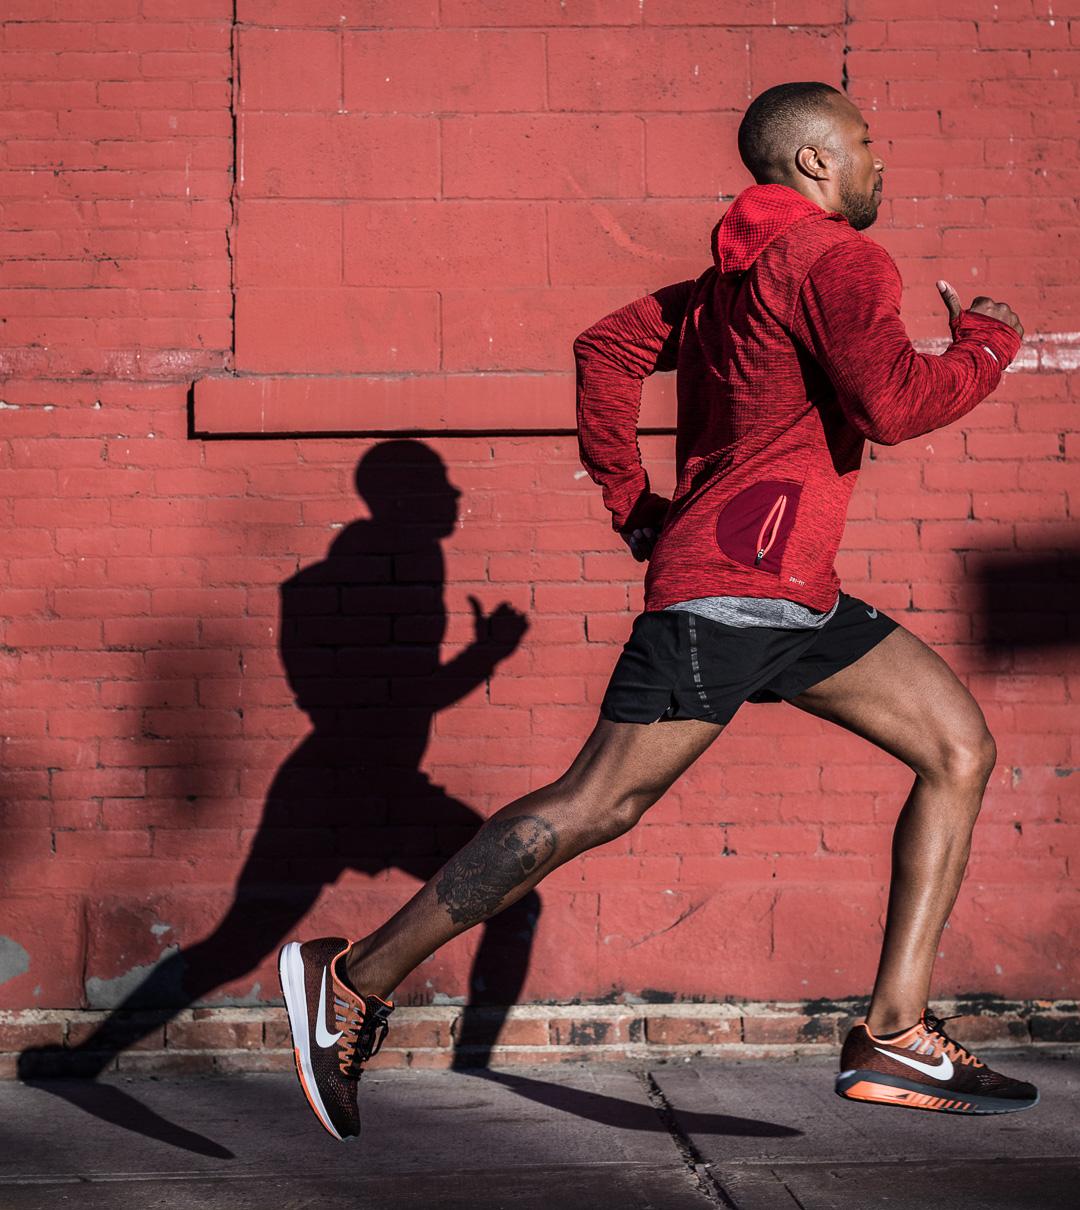 Ashley Barker Photography Nike New York Running Shadows Brick Wall Red Jacket Shorts Concrete